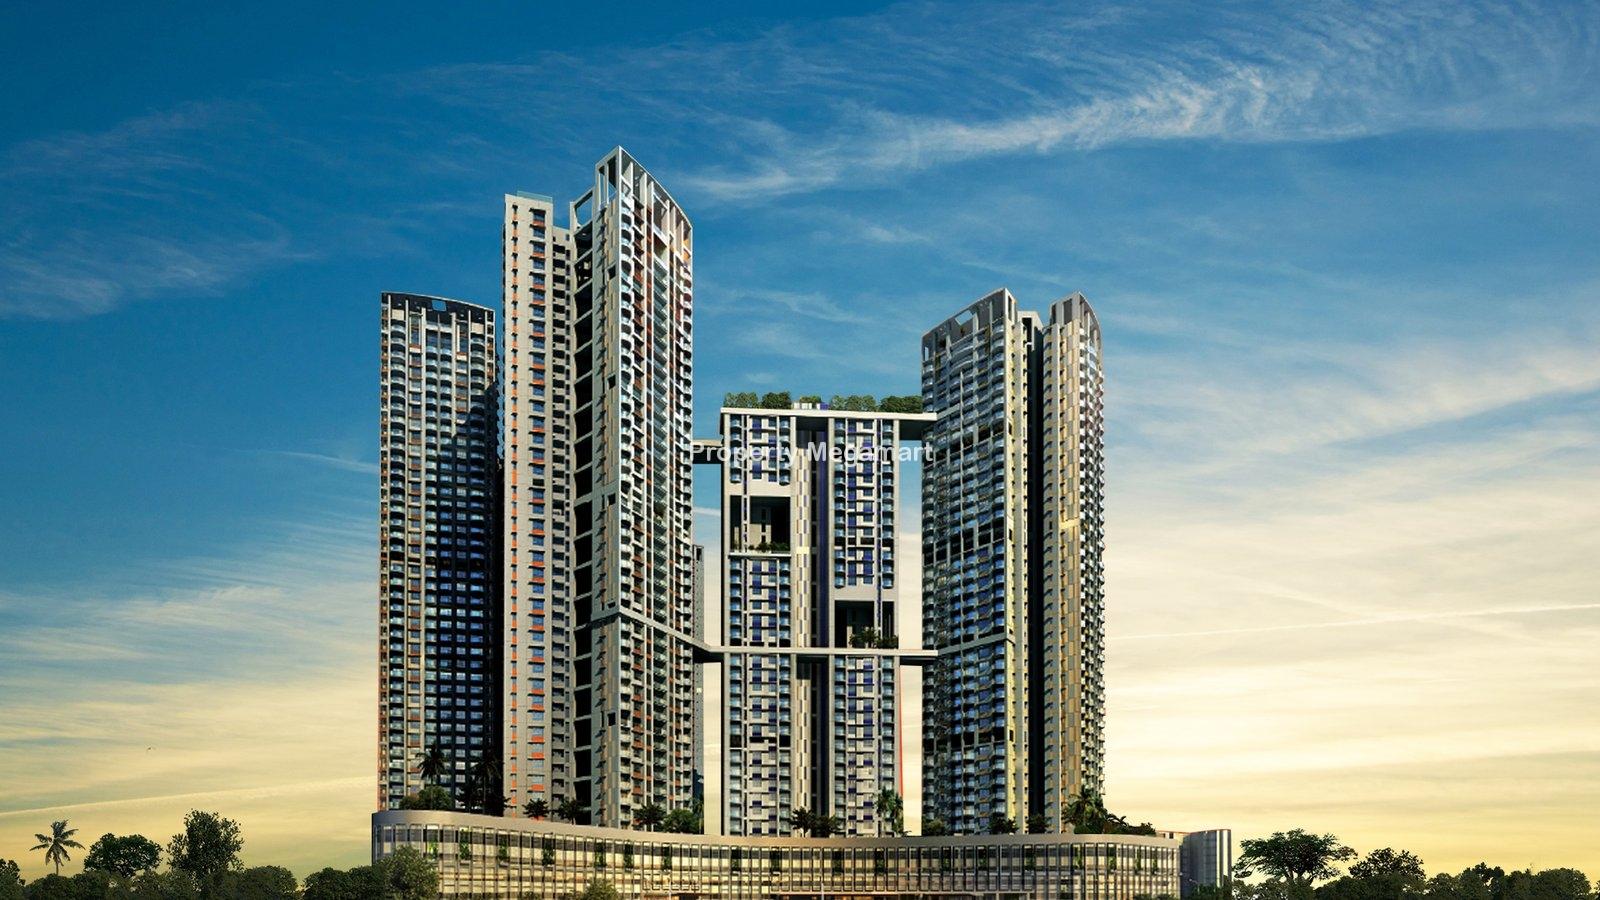 TATA Gateway Towers